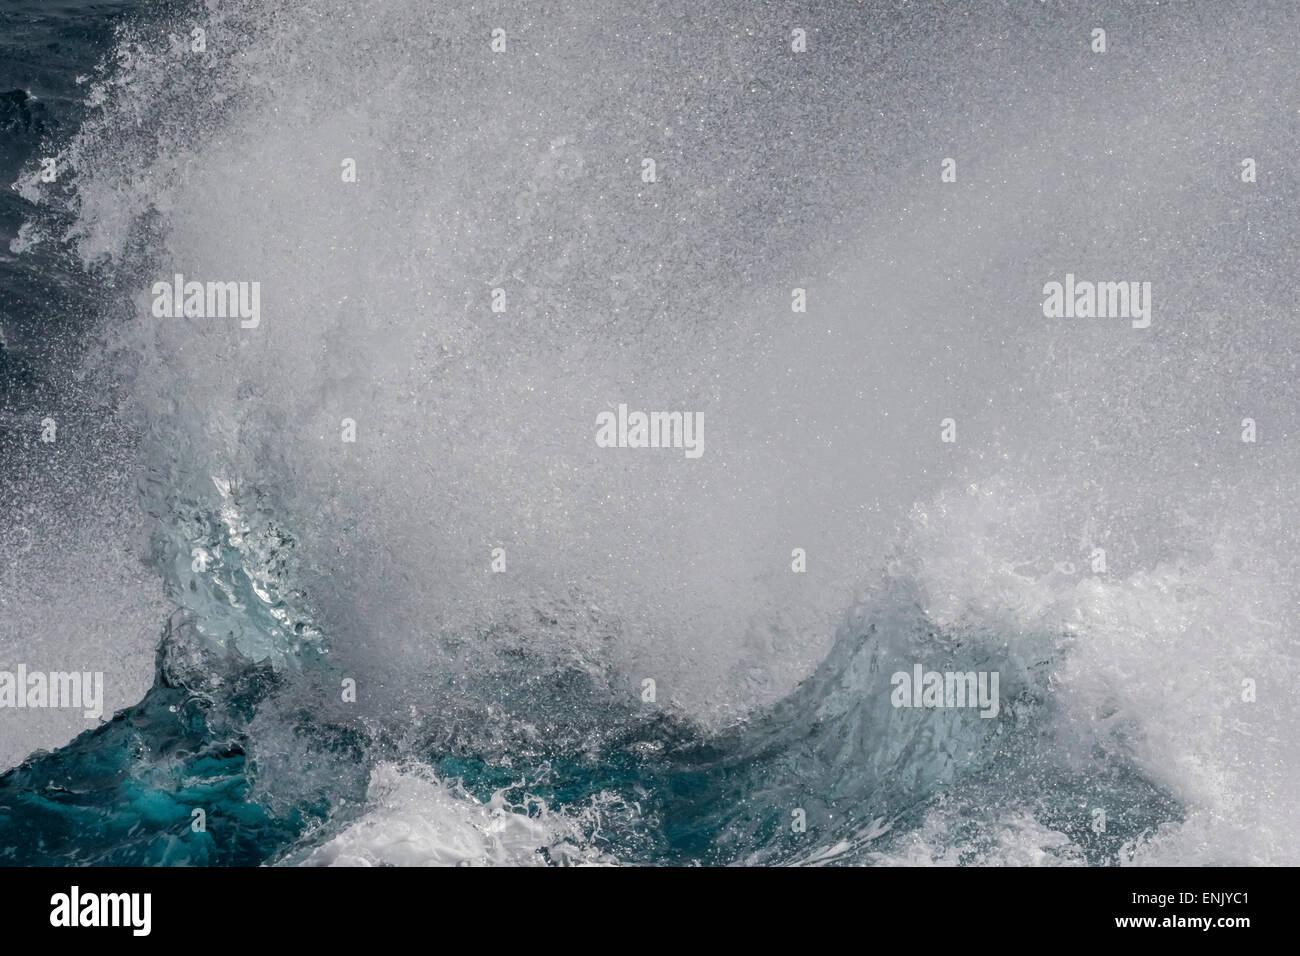 High seas breaking in English Strait, South Shetland Islands, Antarctica, Polar Regions - Stock Image